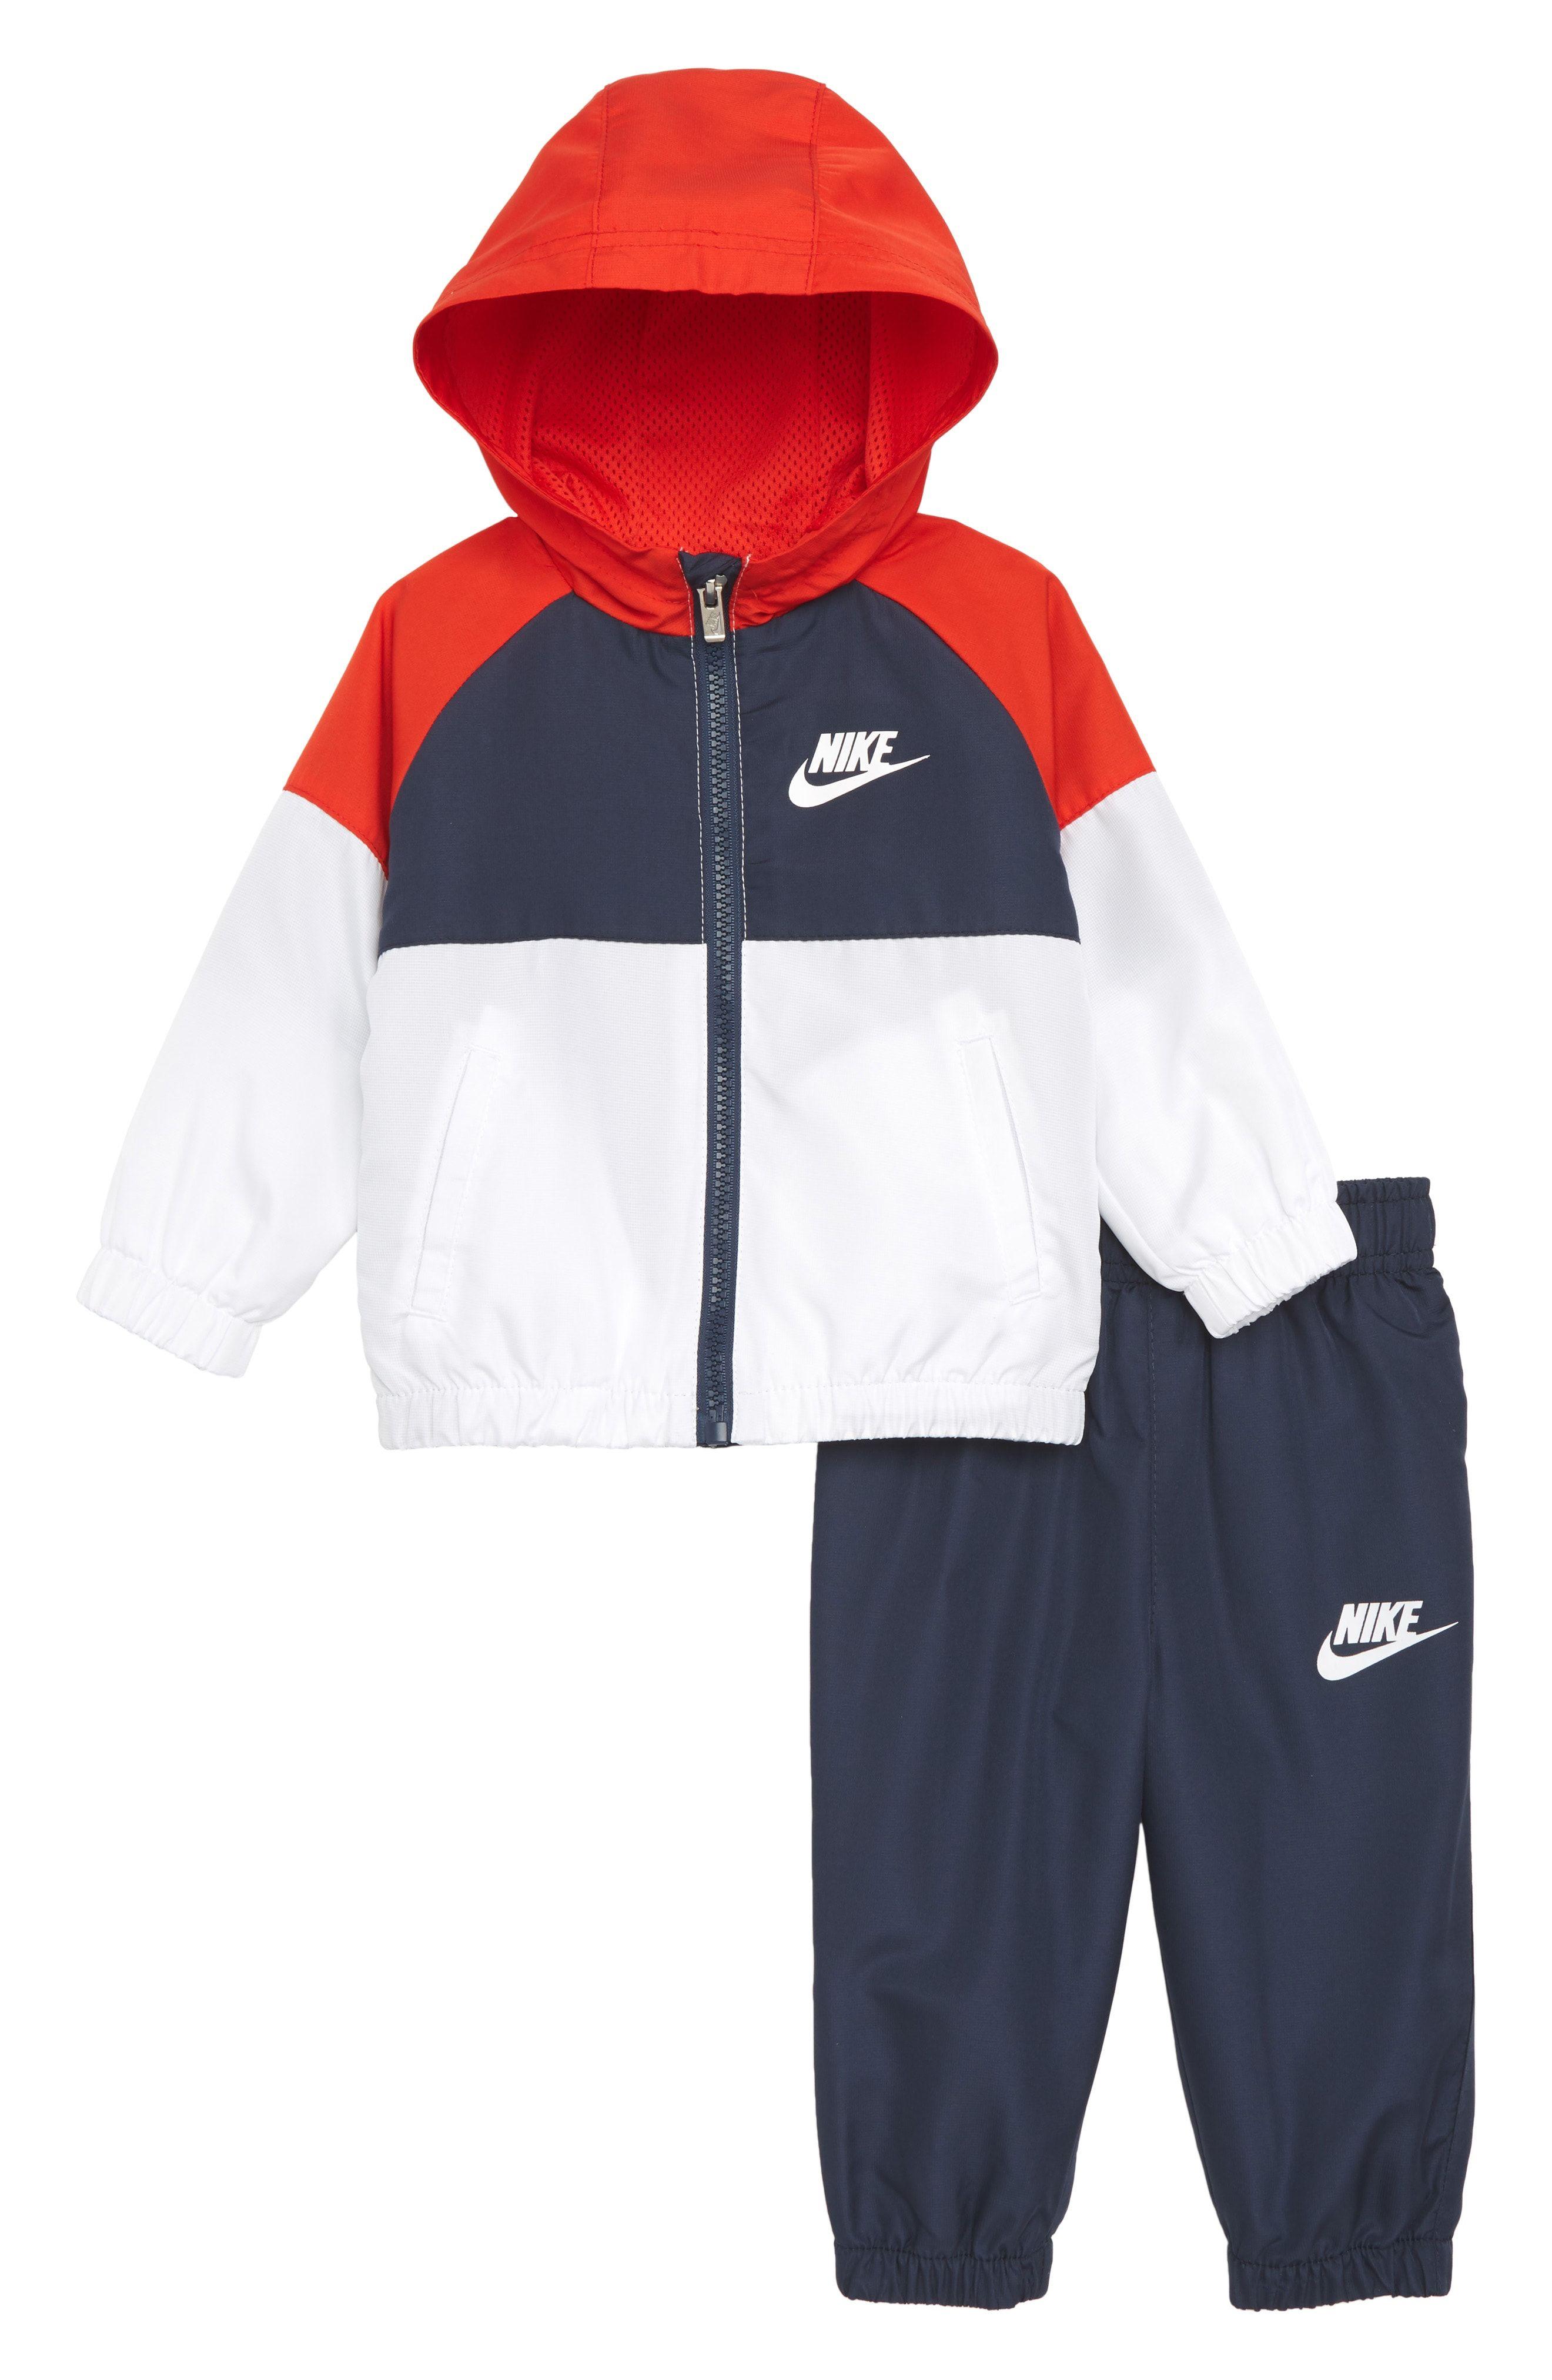 Nike Baby Boy Hooded Sweatshirt /& Jogging Pants Set ~ Navy Blue /& Black ~